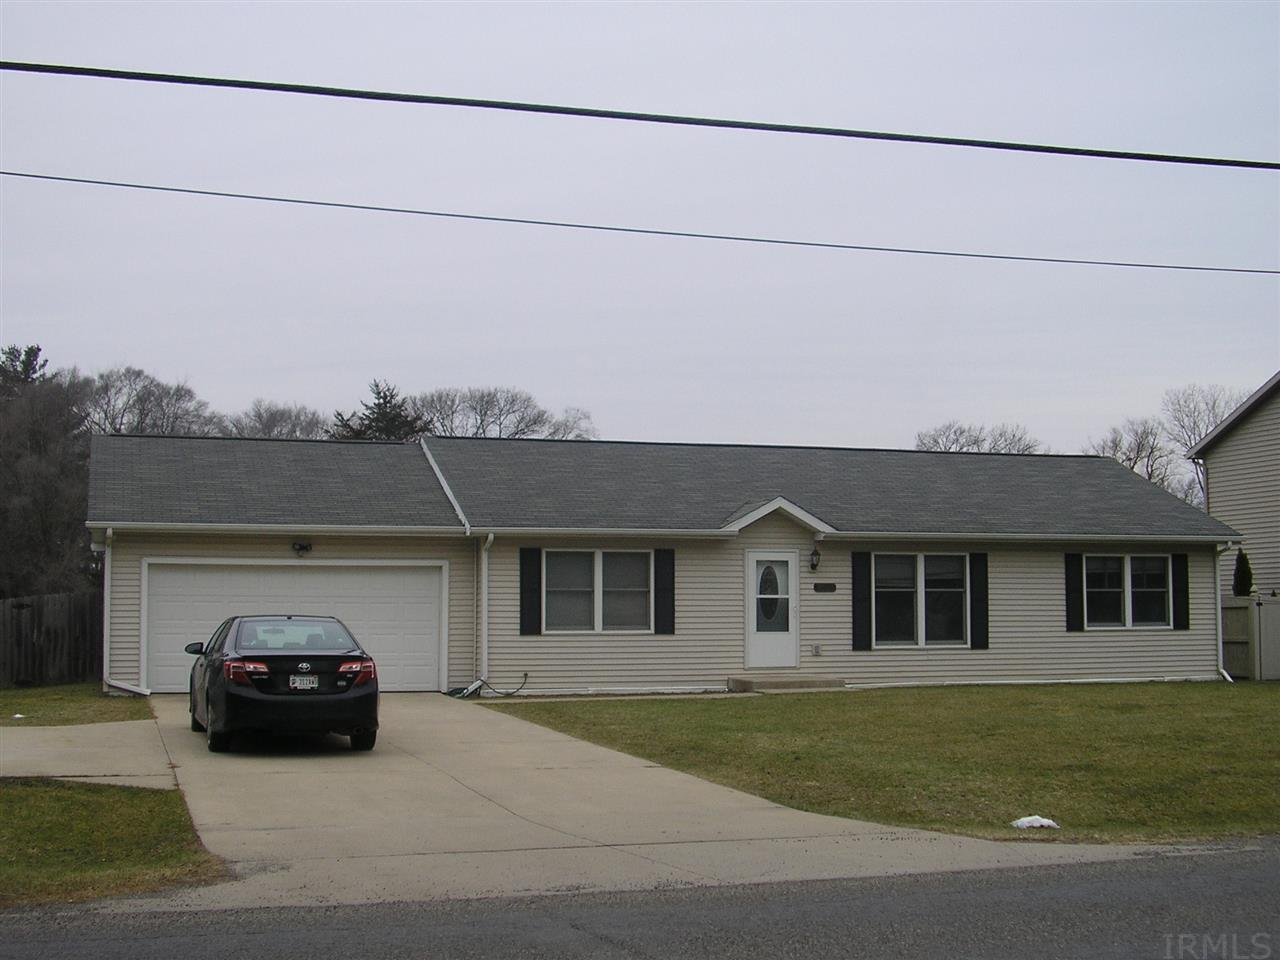 53271  County Road 11 Elkhart, IN 46514